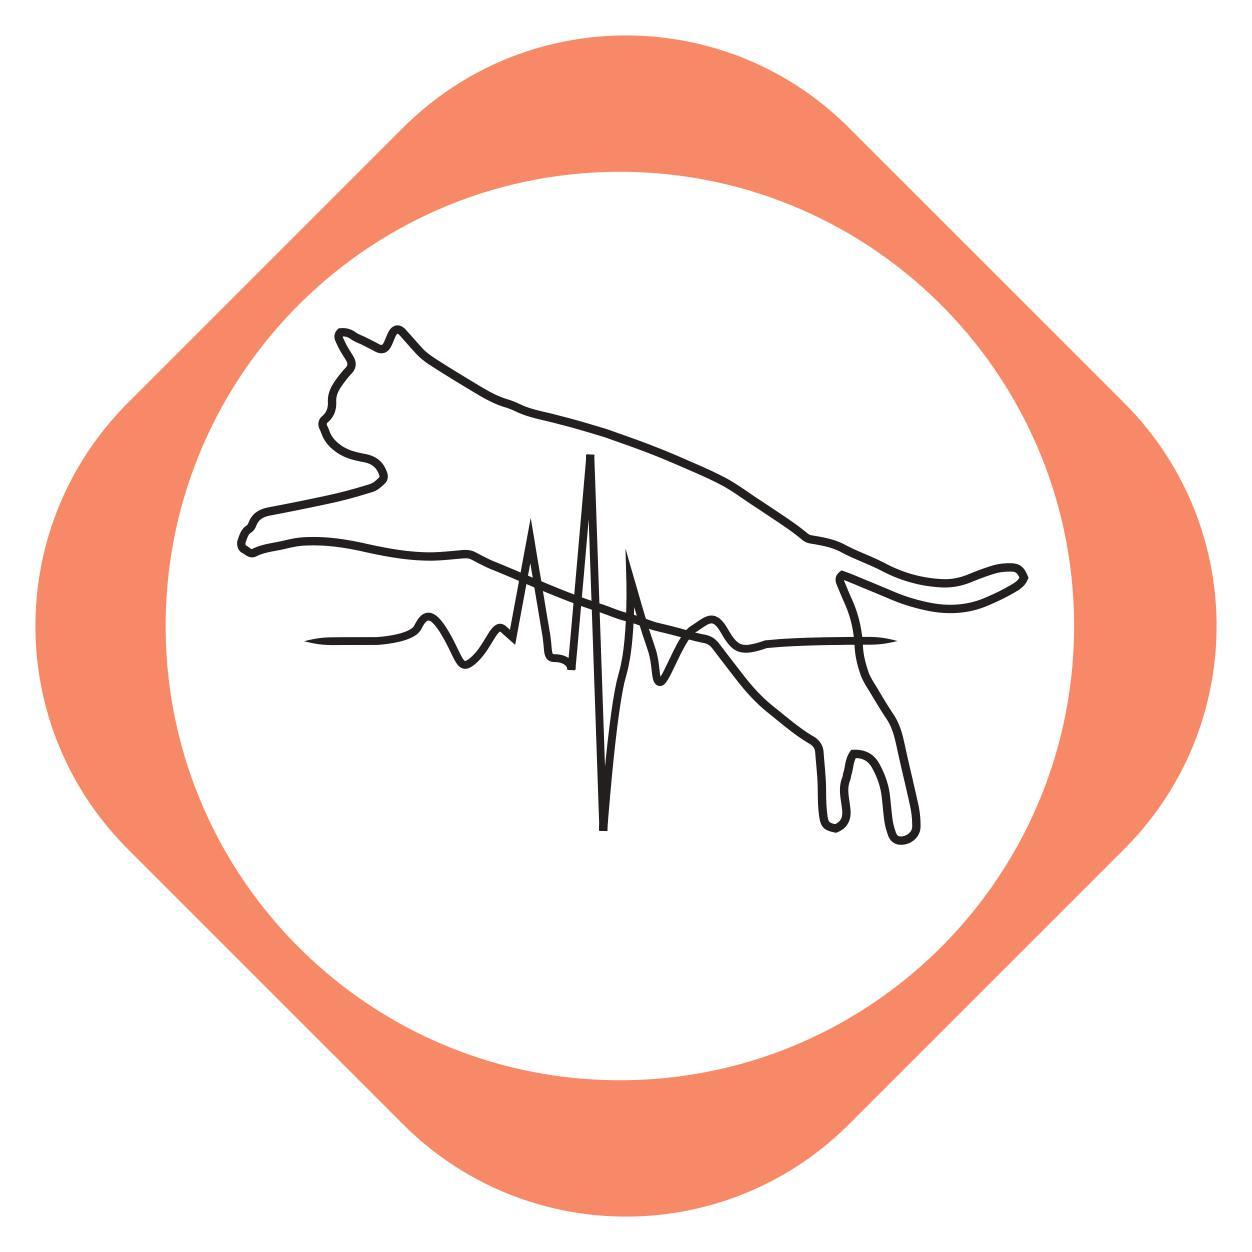 https://pets.alfa-vet.com/image/catalog/avatars/0051.jpg